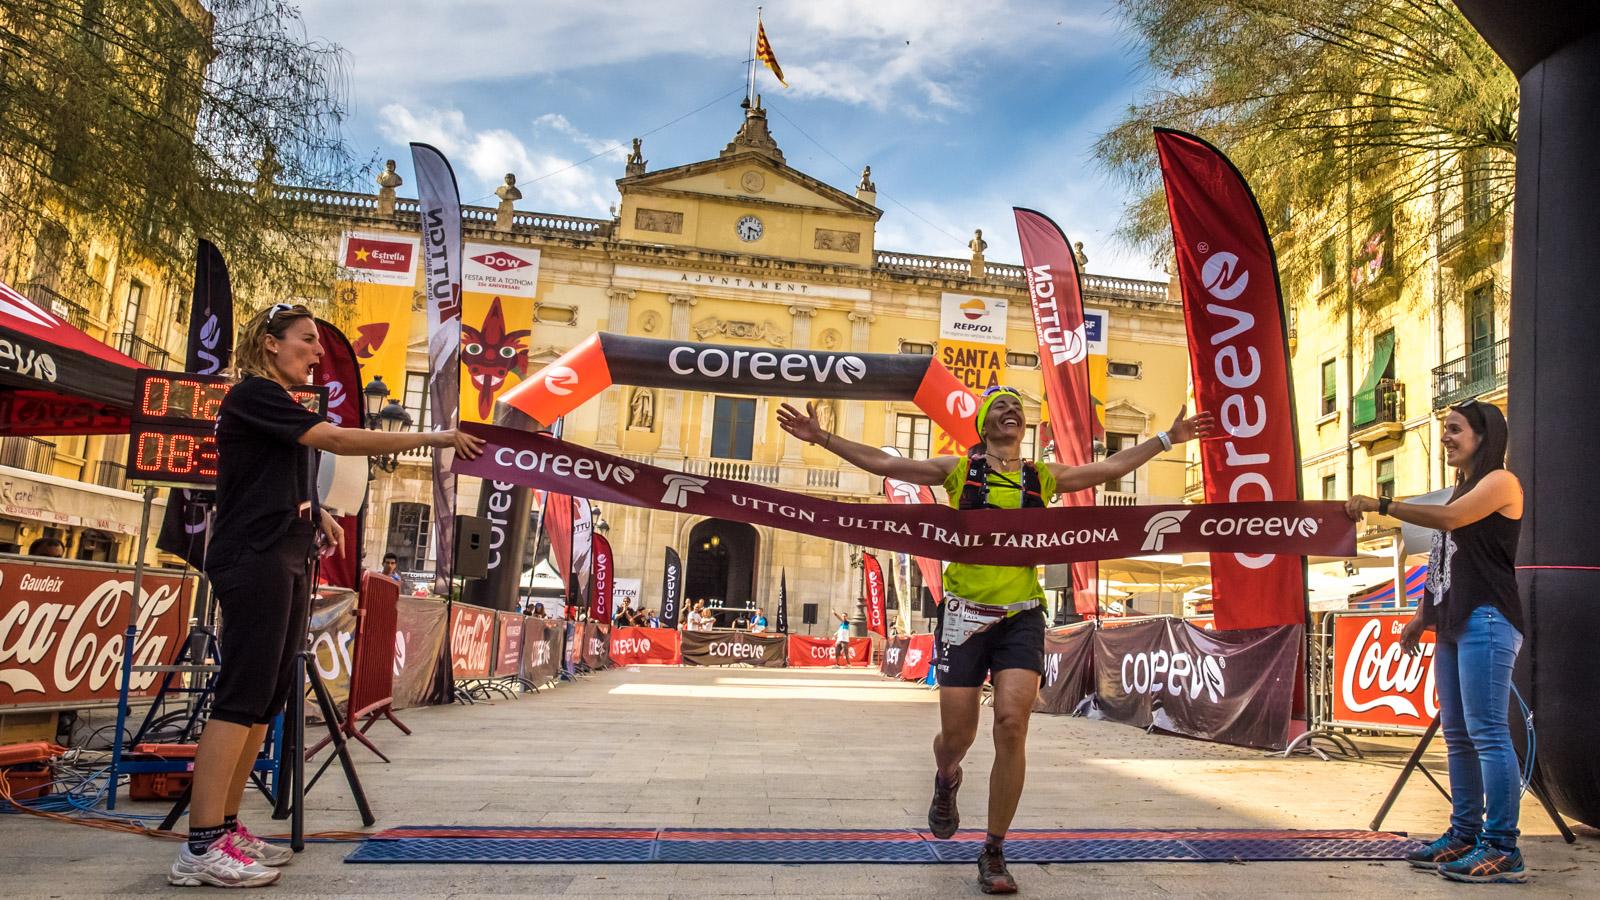 Ultra Trail Tarragona (Tarragona)